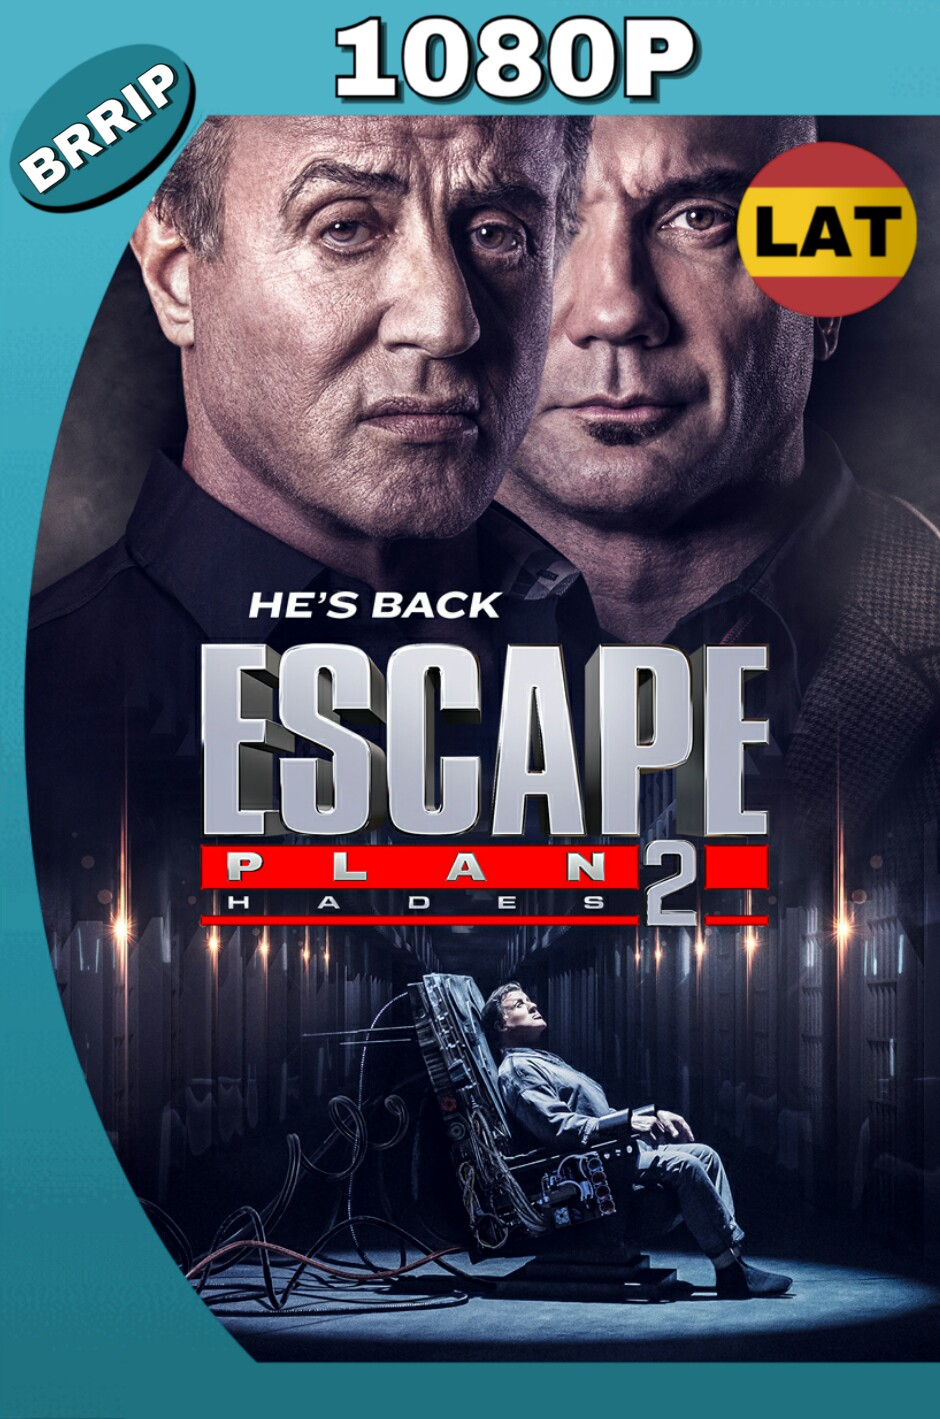 PLAN DE ESCAPE 2 (2018) BRRIP 1080P LATINO MKV